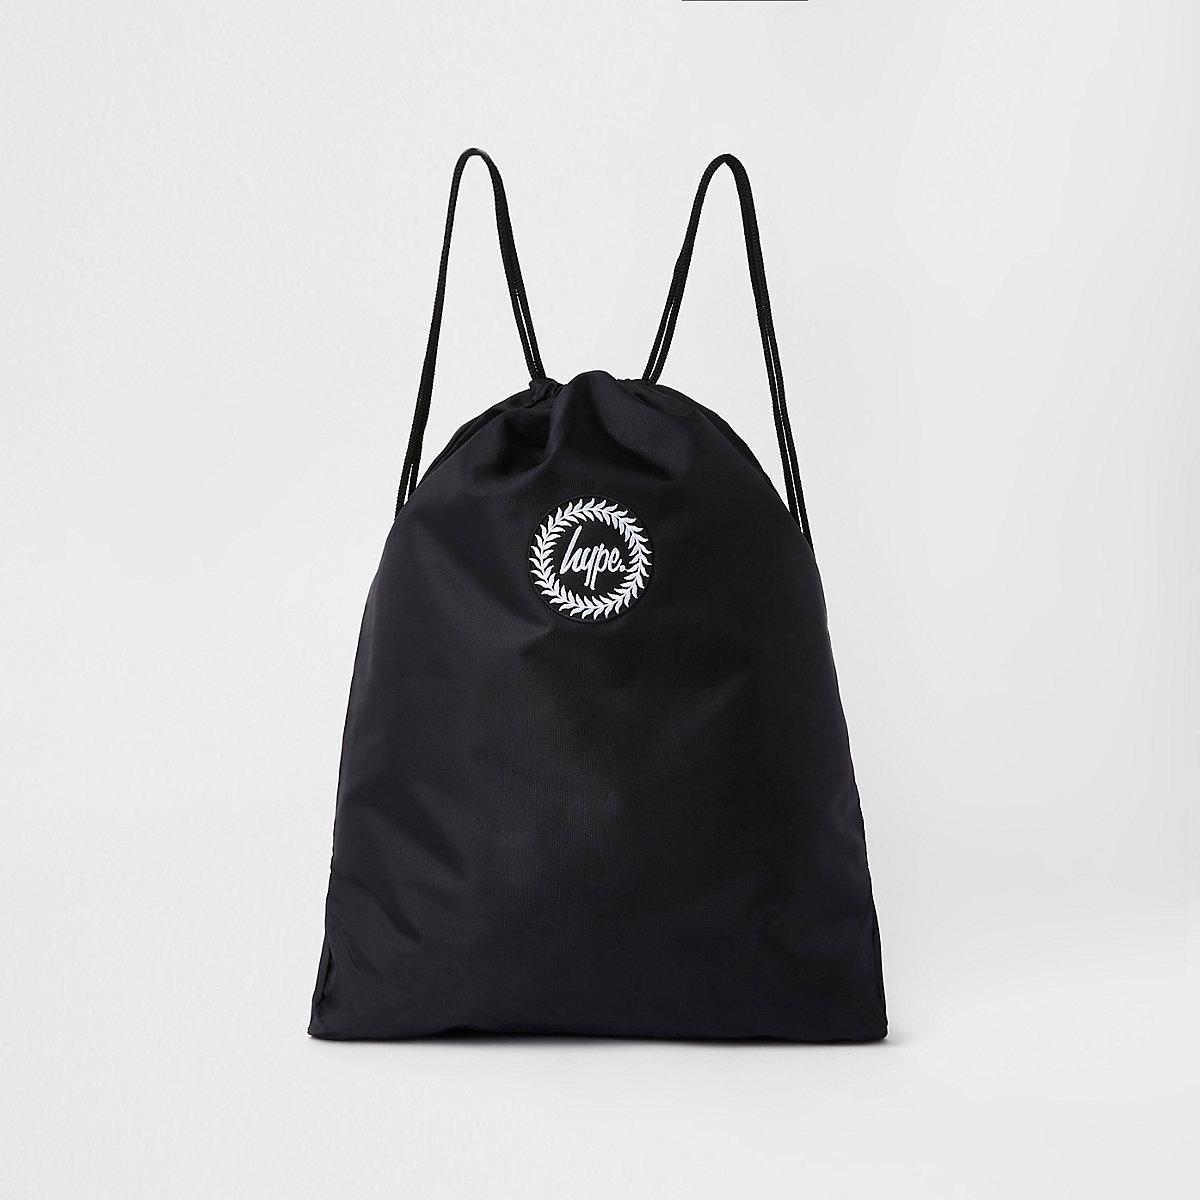 Hype black embroidery drawstring bag